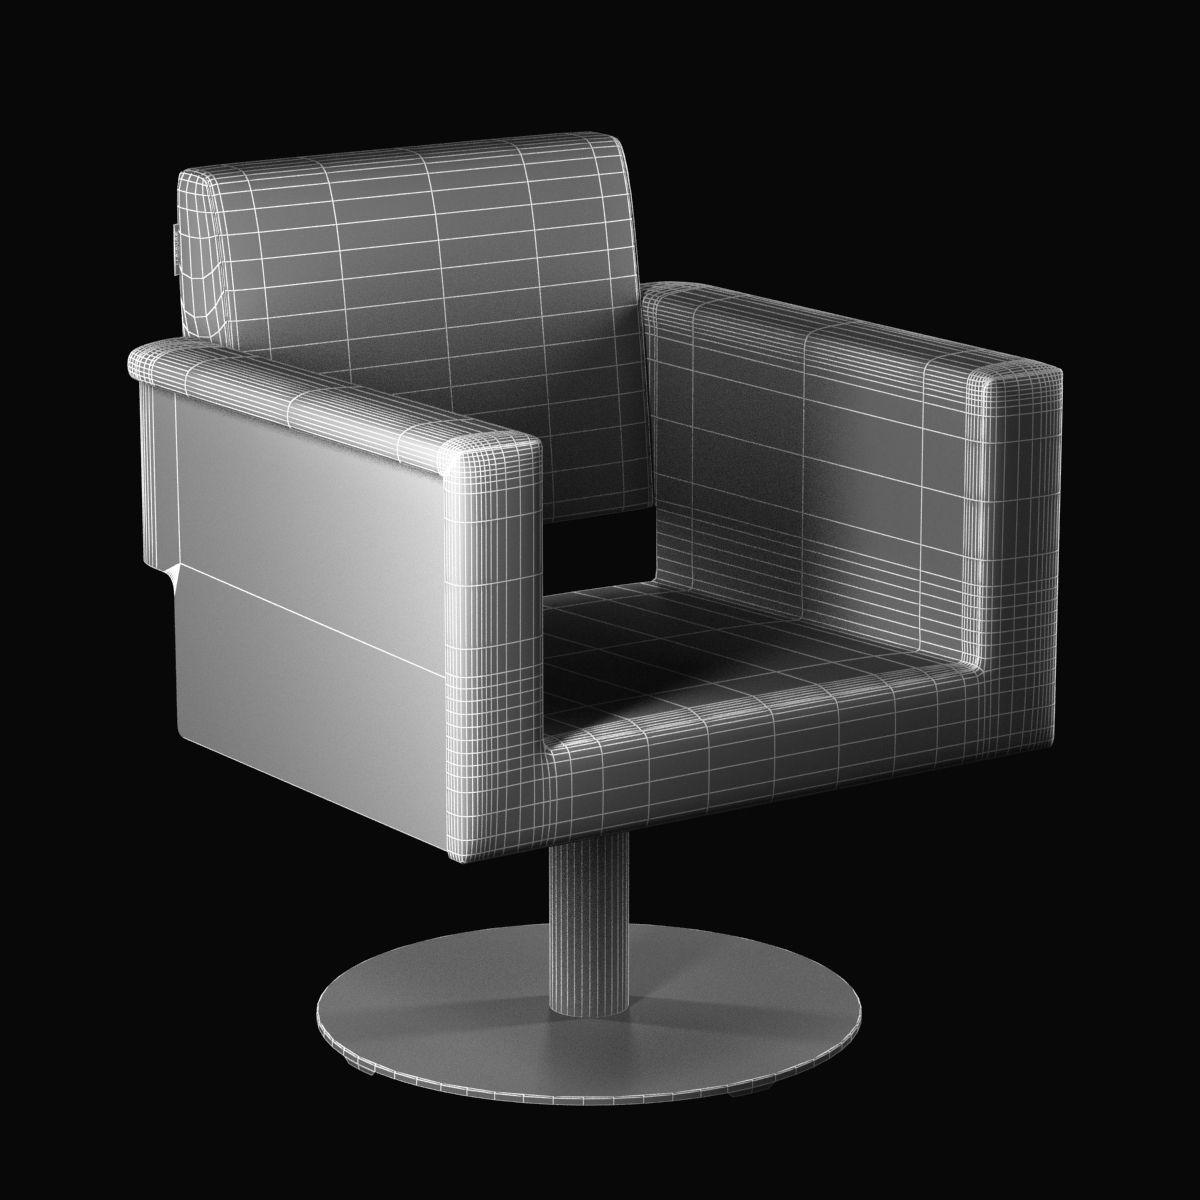 Comfort Chair Price Welonda Comfort Chair 3d Model Cgtrader